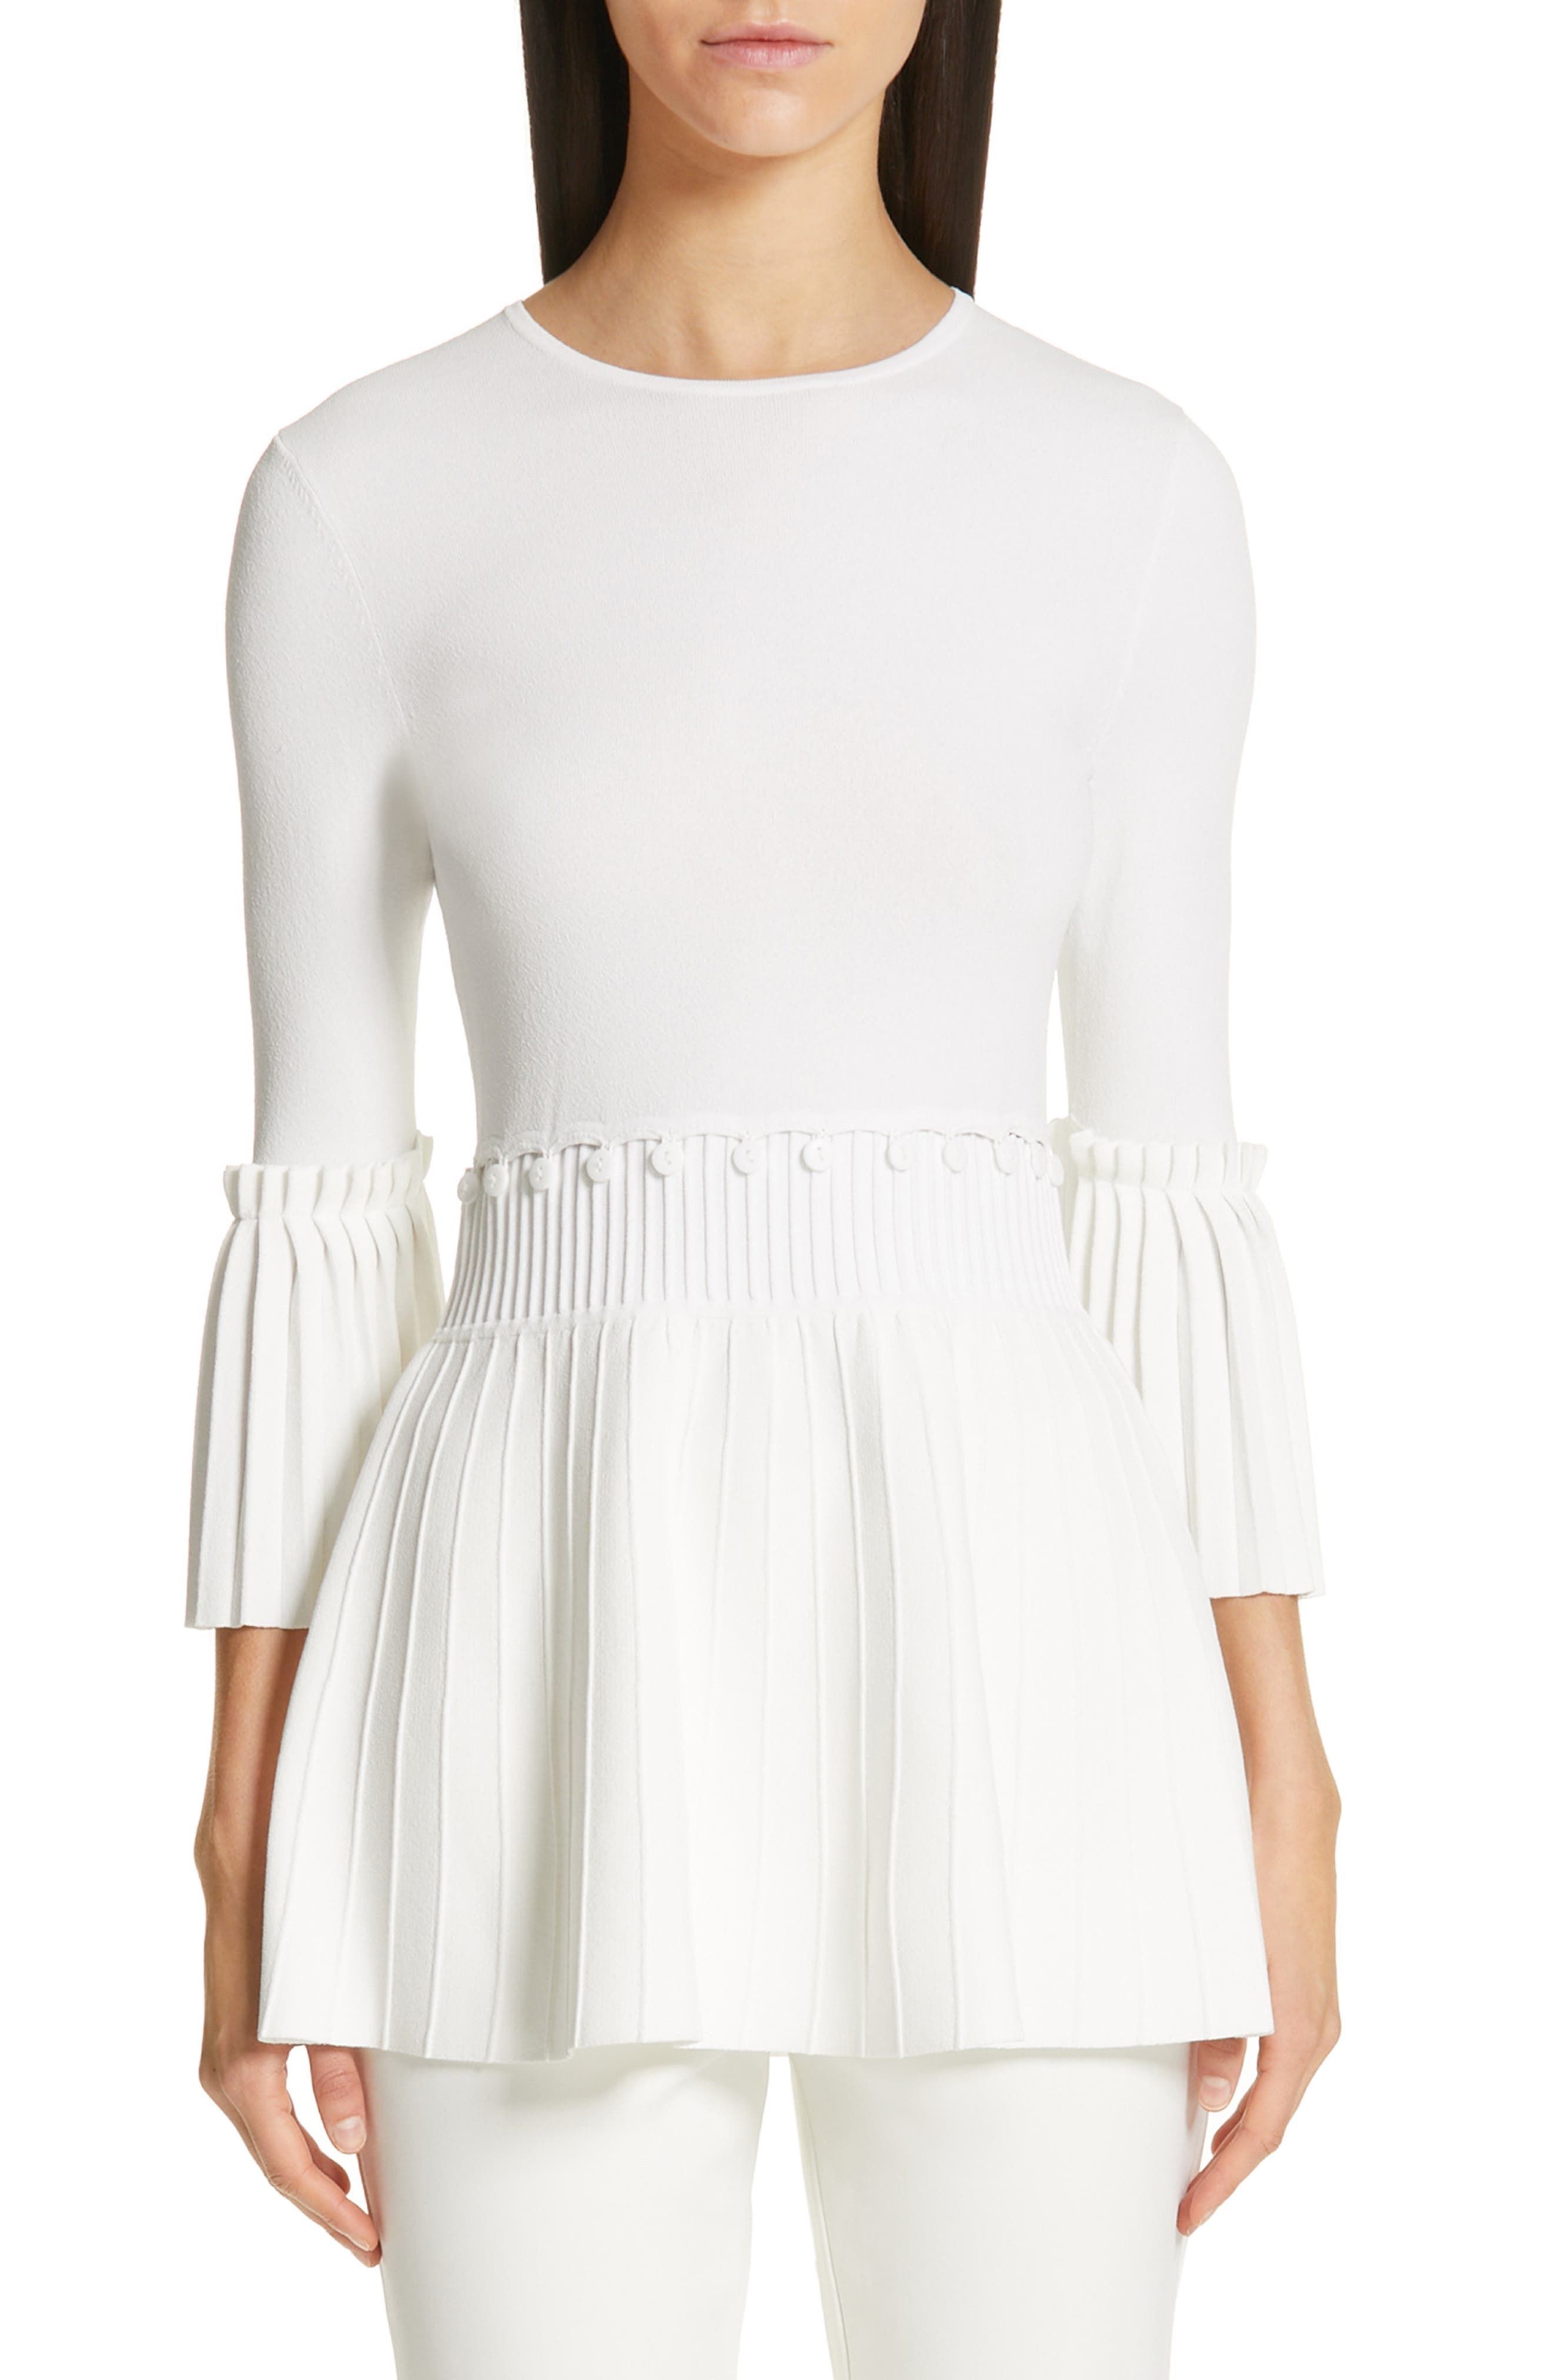 LELA ROSE,                             Pleated Knit Top,                             Main thumbnail 1, color,                             WHITE